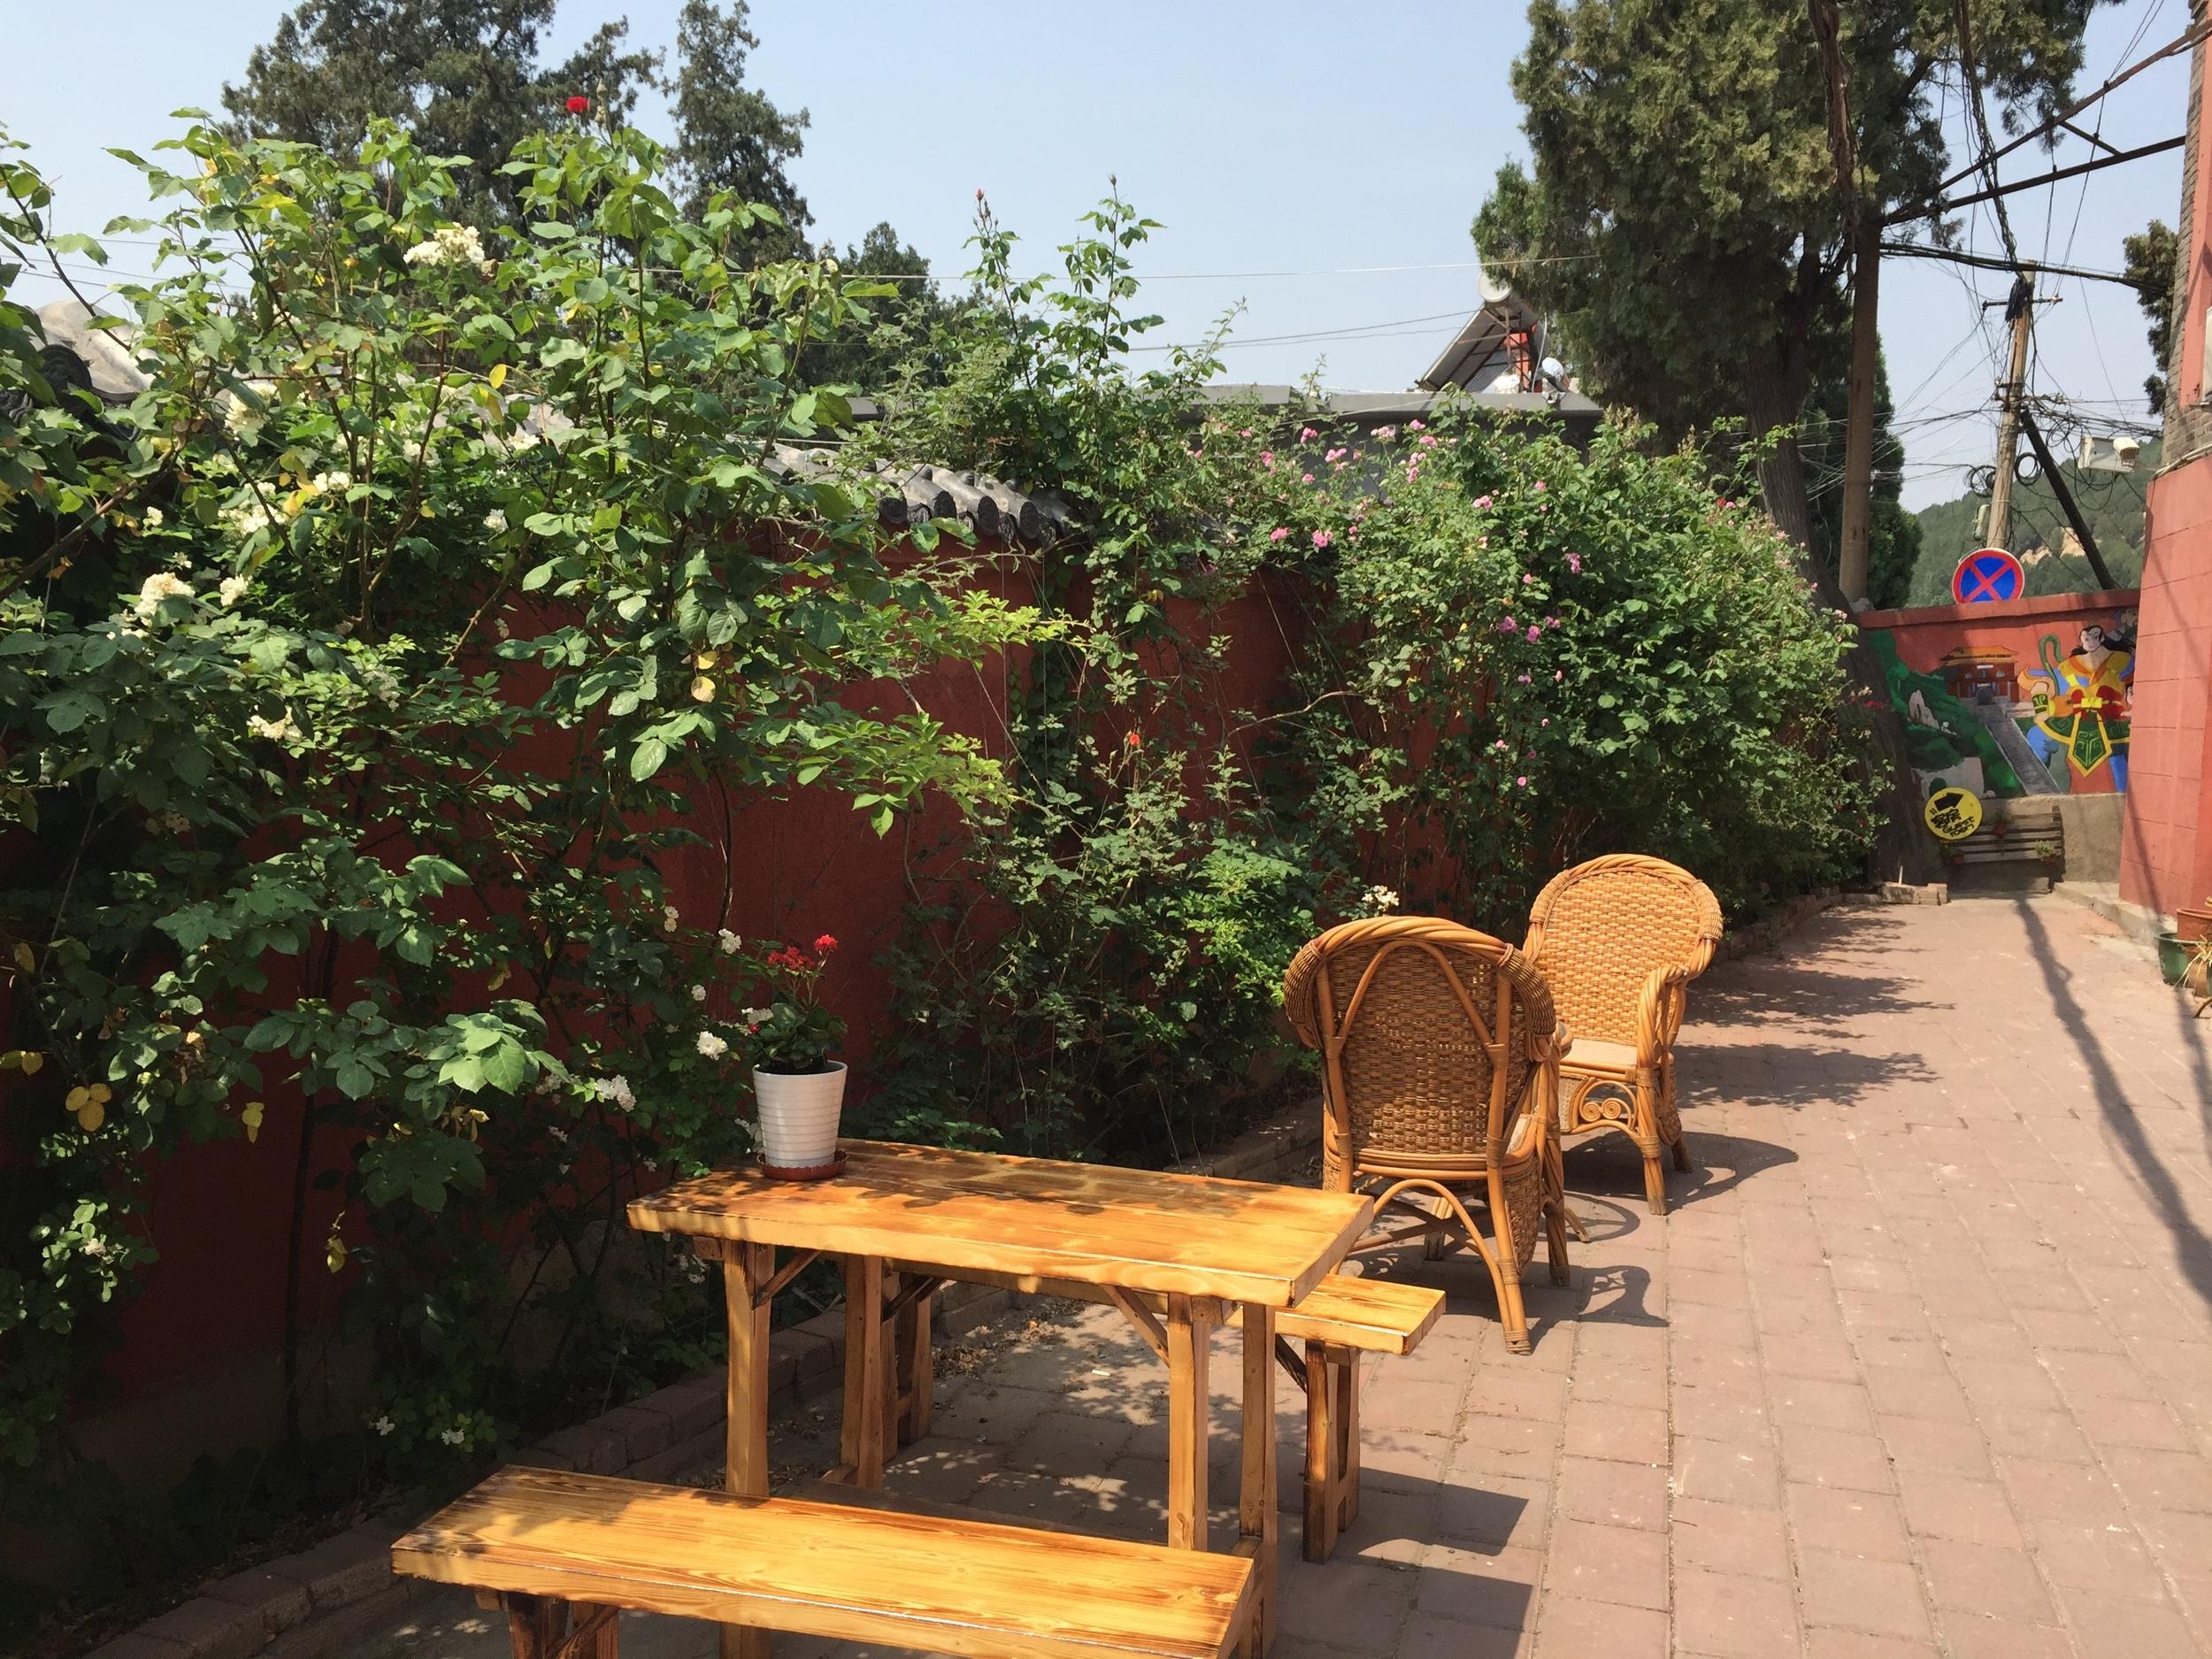 Hostel courtyard.